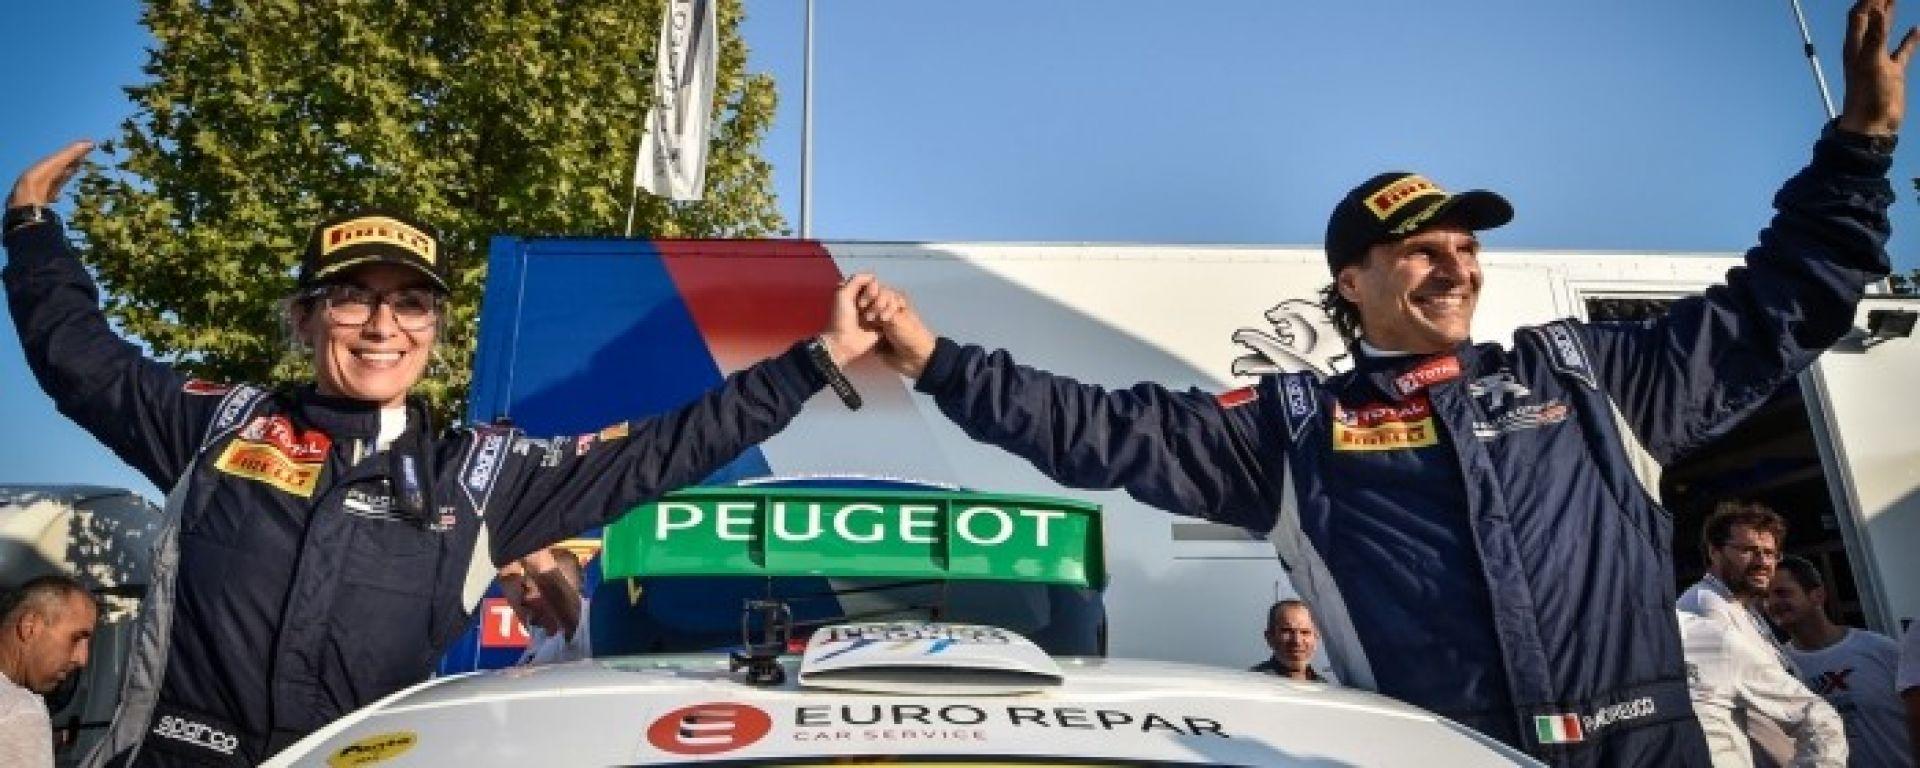 Il video di Peugeot Sport Italia per Andreucci - Andreussi